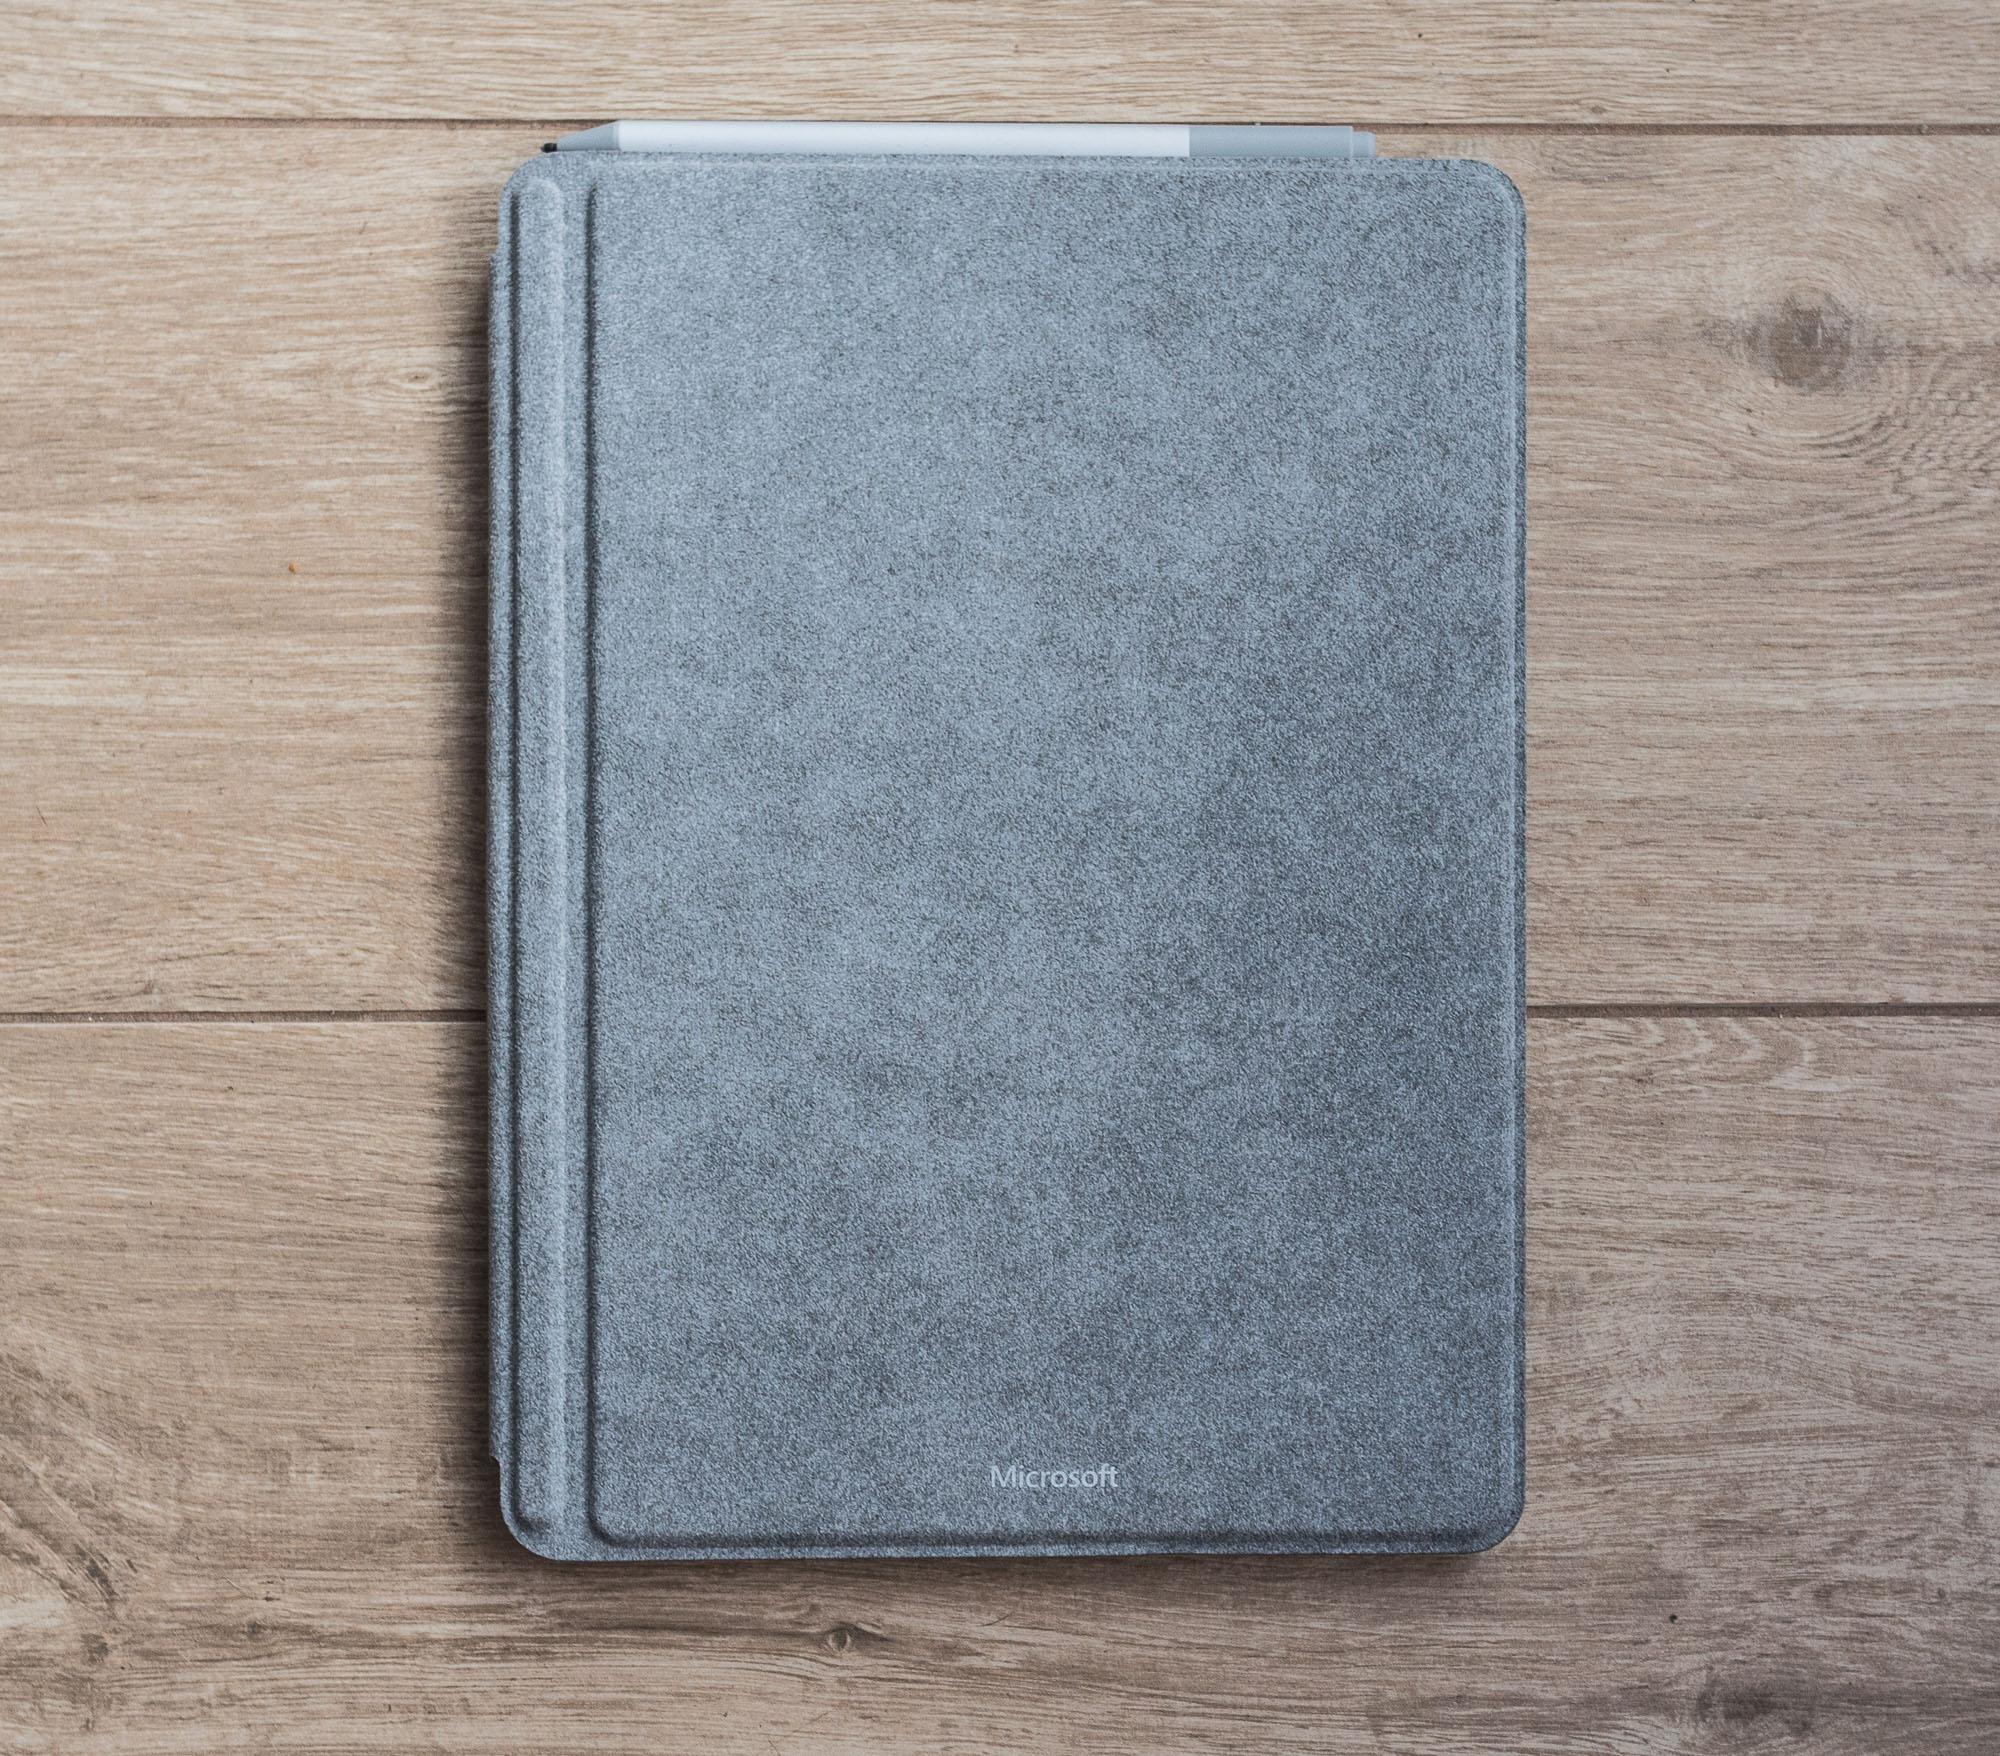 Surface Go recenzja